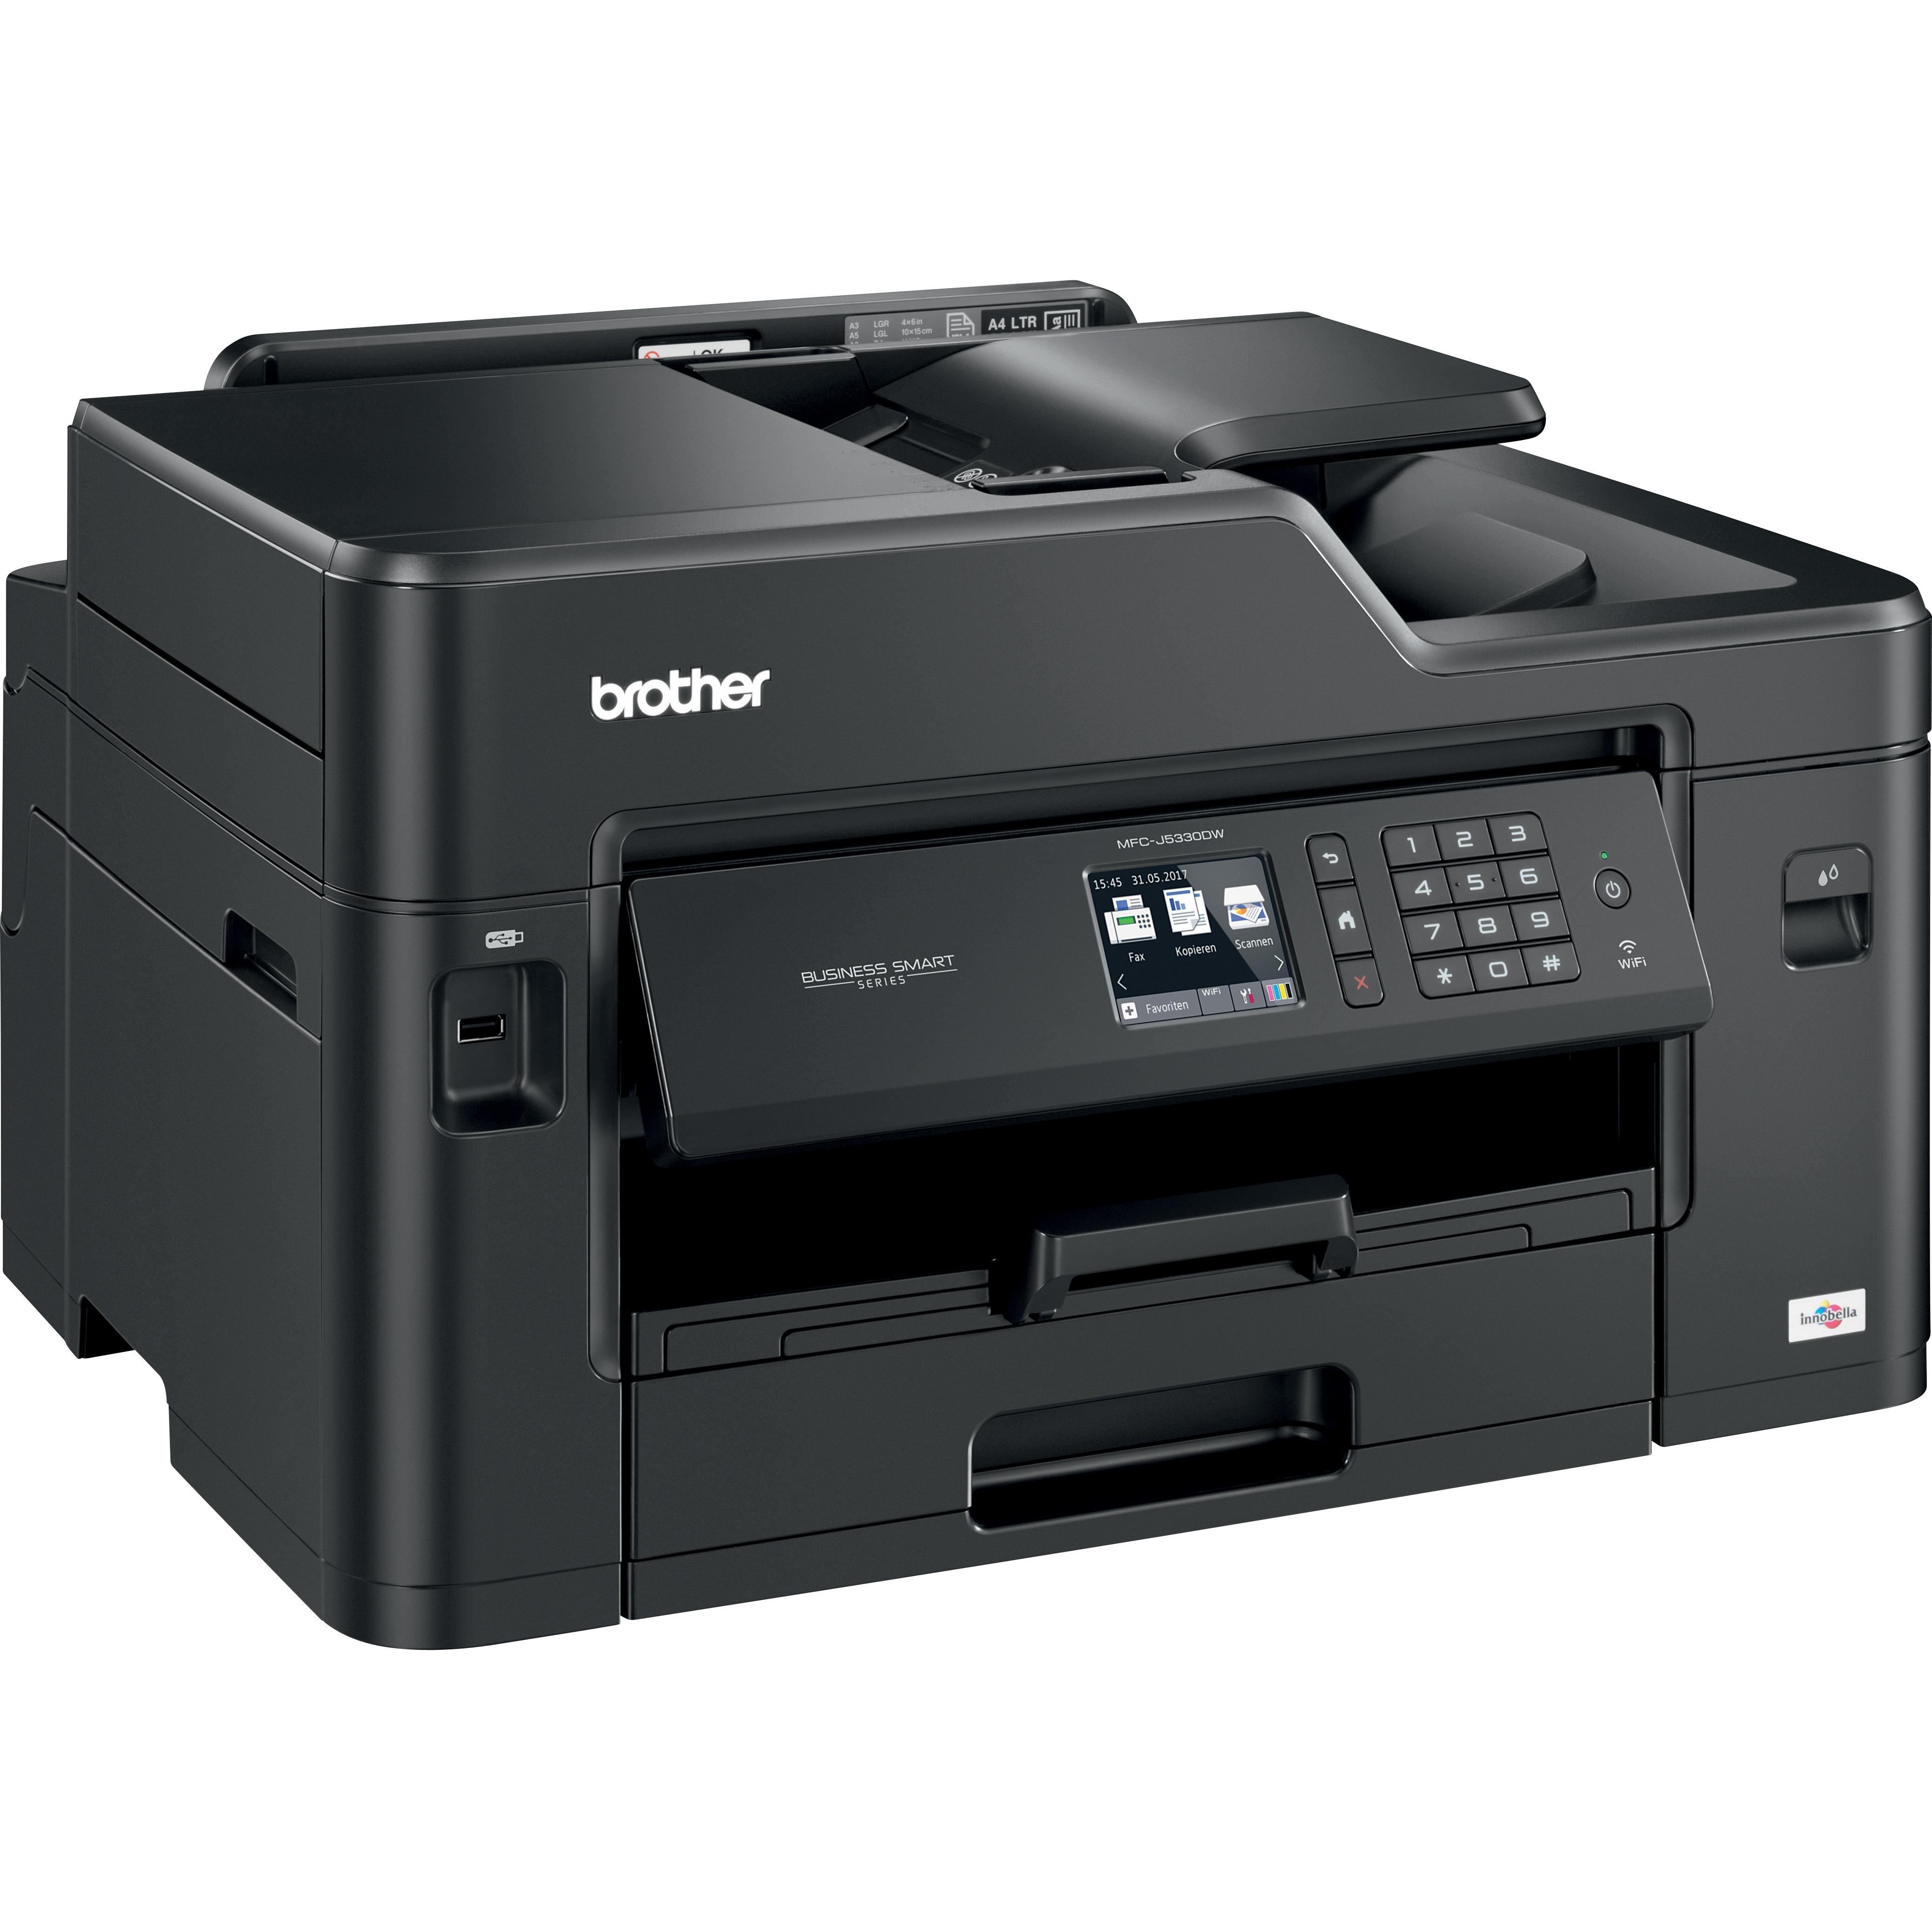 Brother Business Smart MFC-J5330DW Inkjet Multifunction Printer - Colour